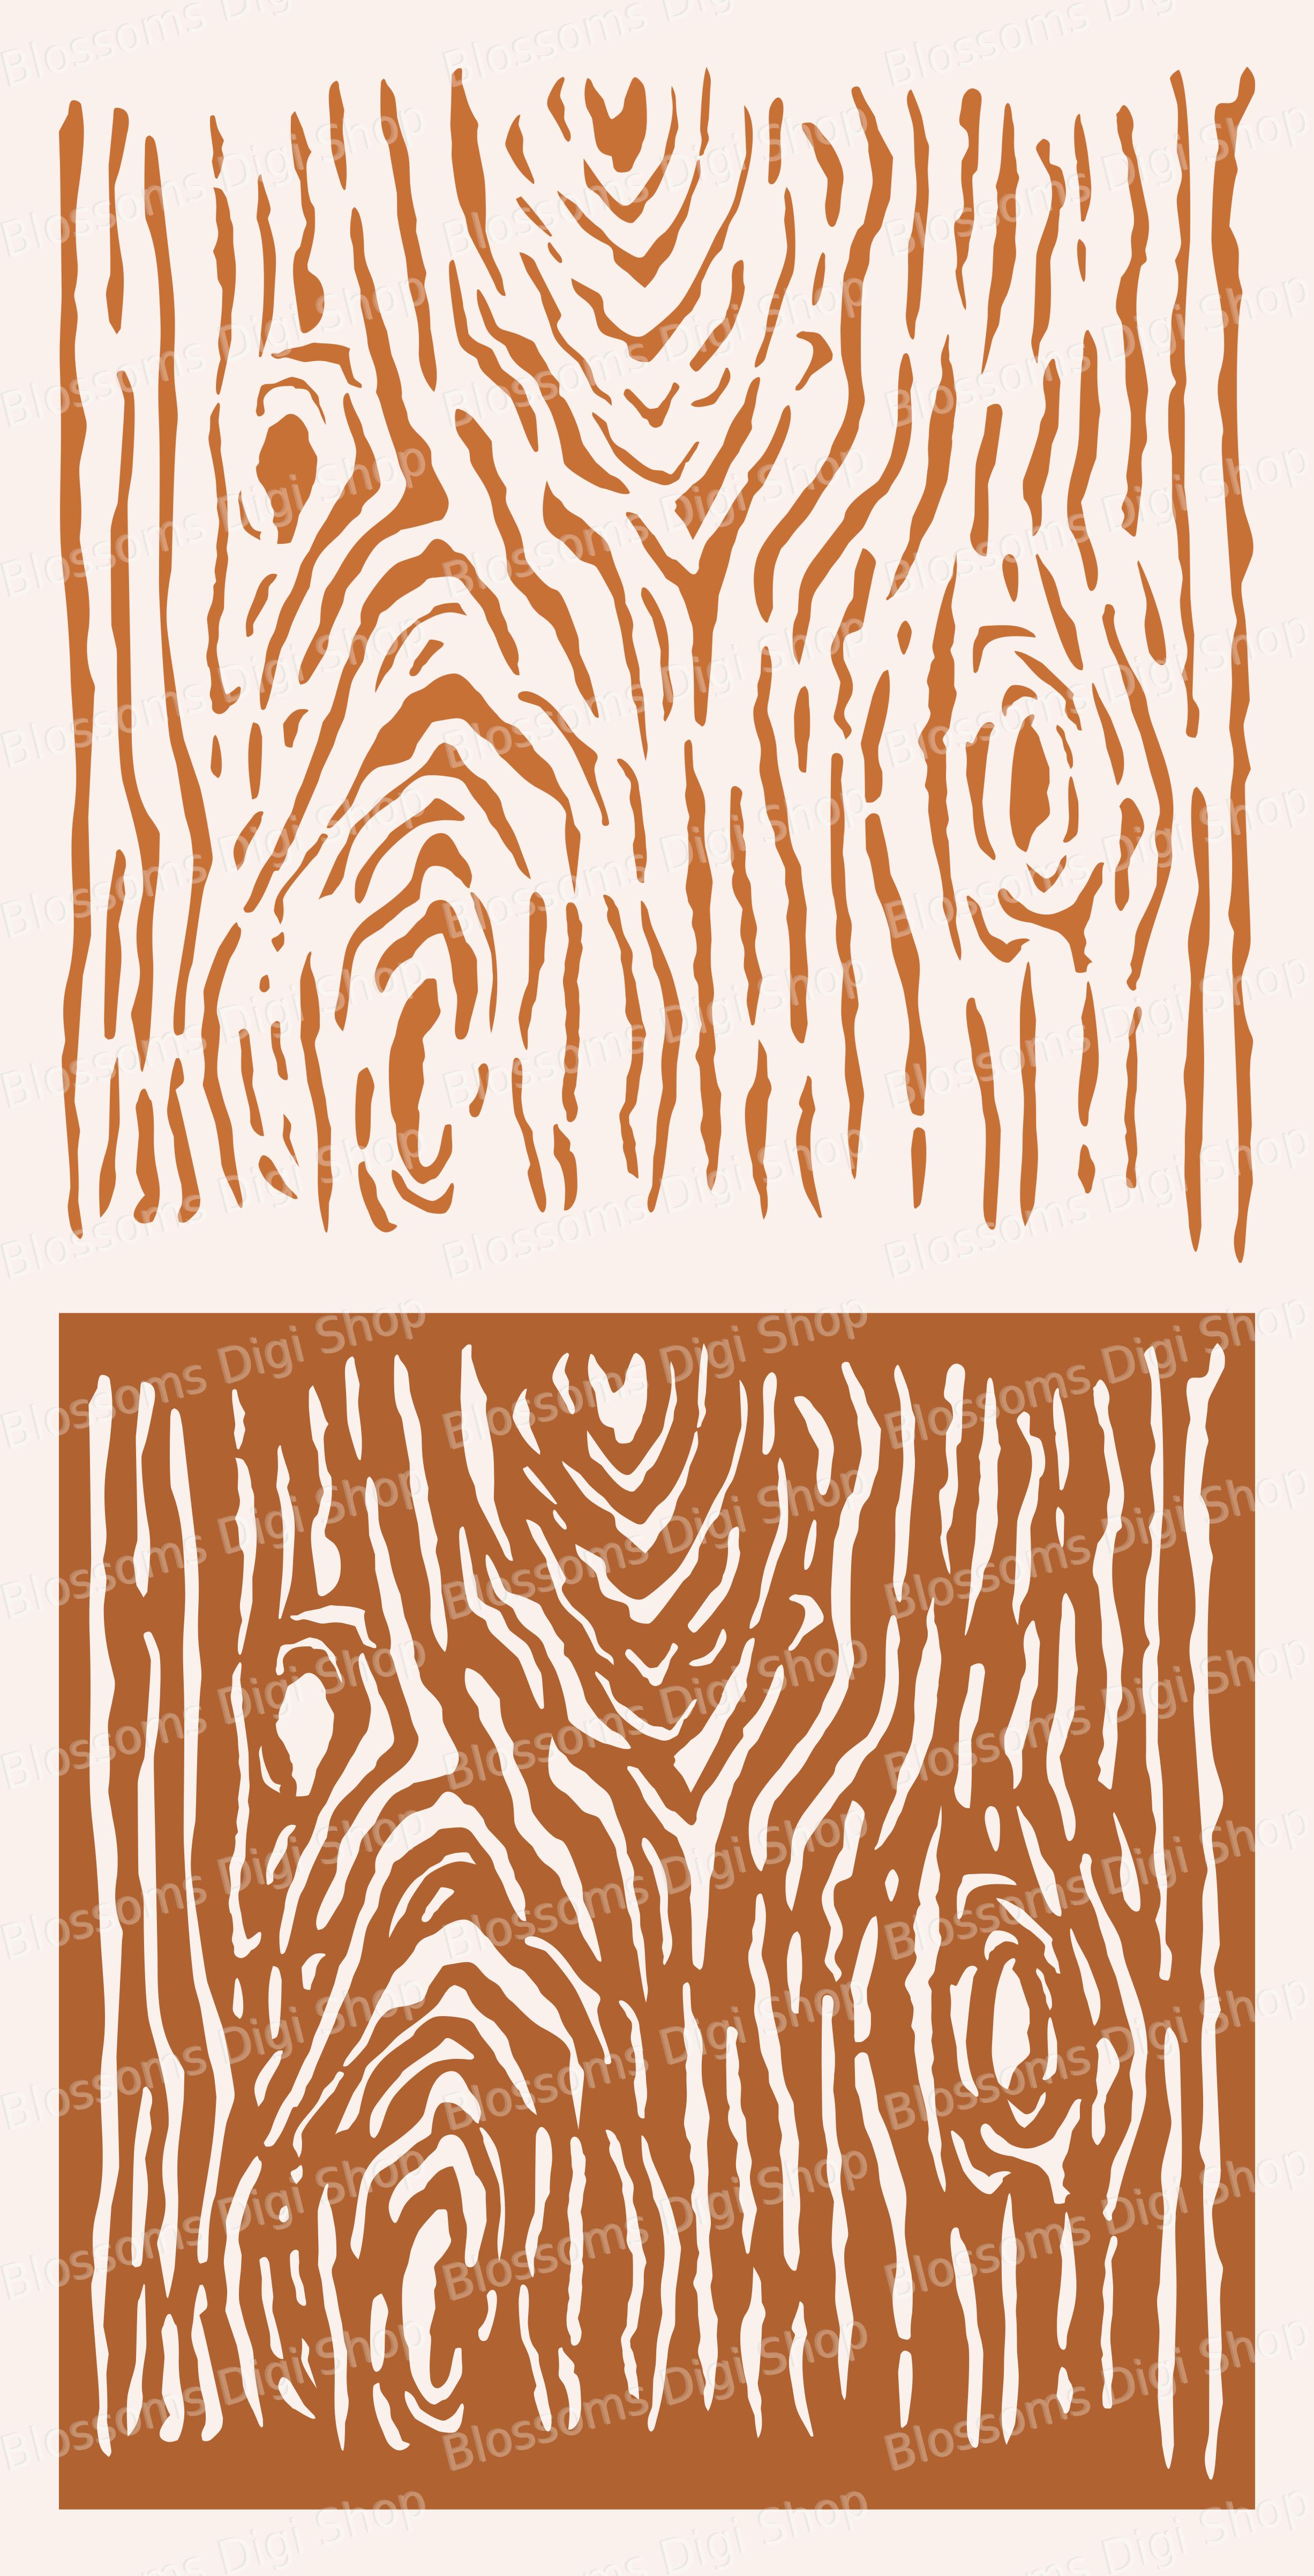 medium resolution of wood patterns stencil patterns tree stencil stencils tree templates tree bark